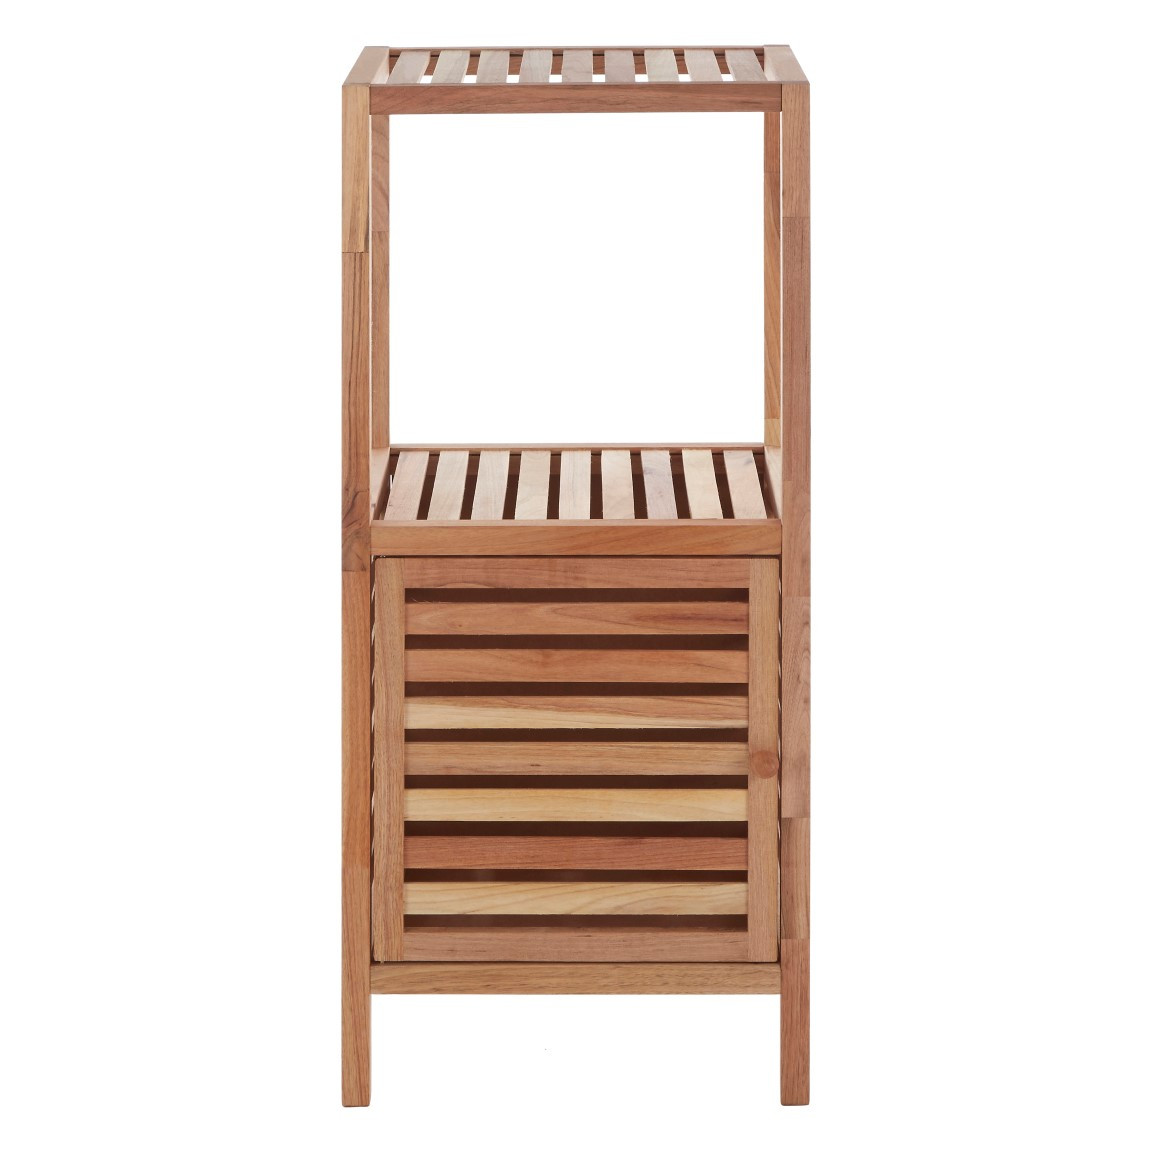 2 Tier Bathroom Shelf | Walnut Wood